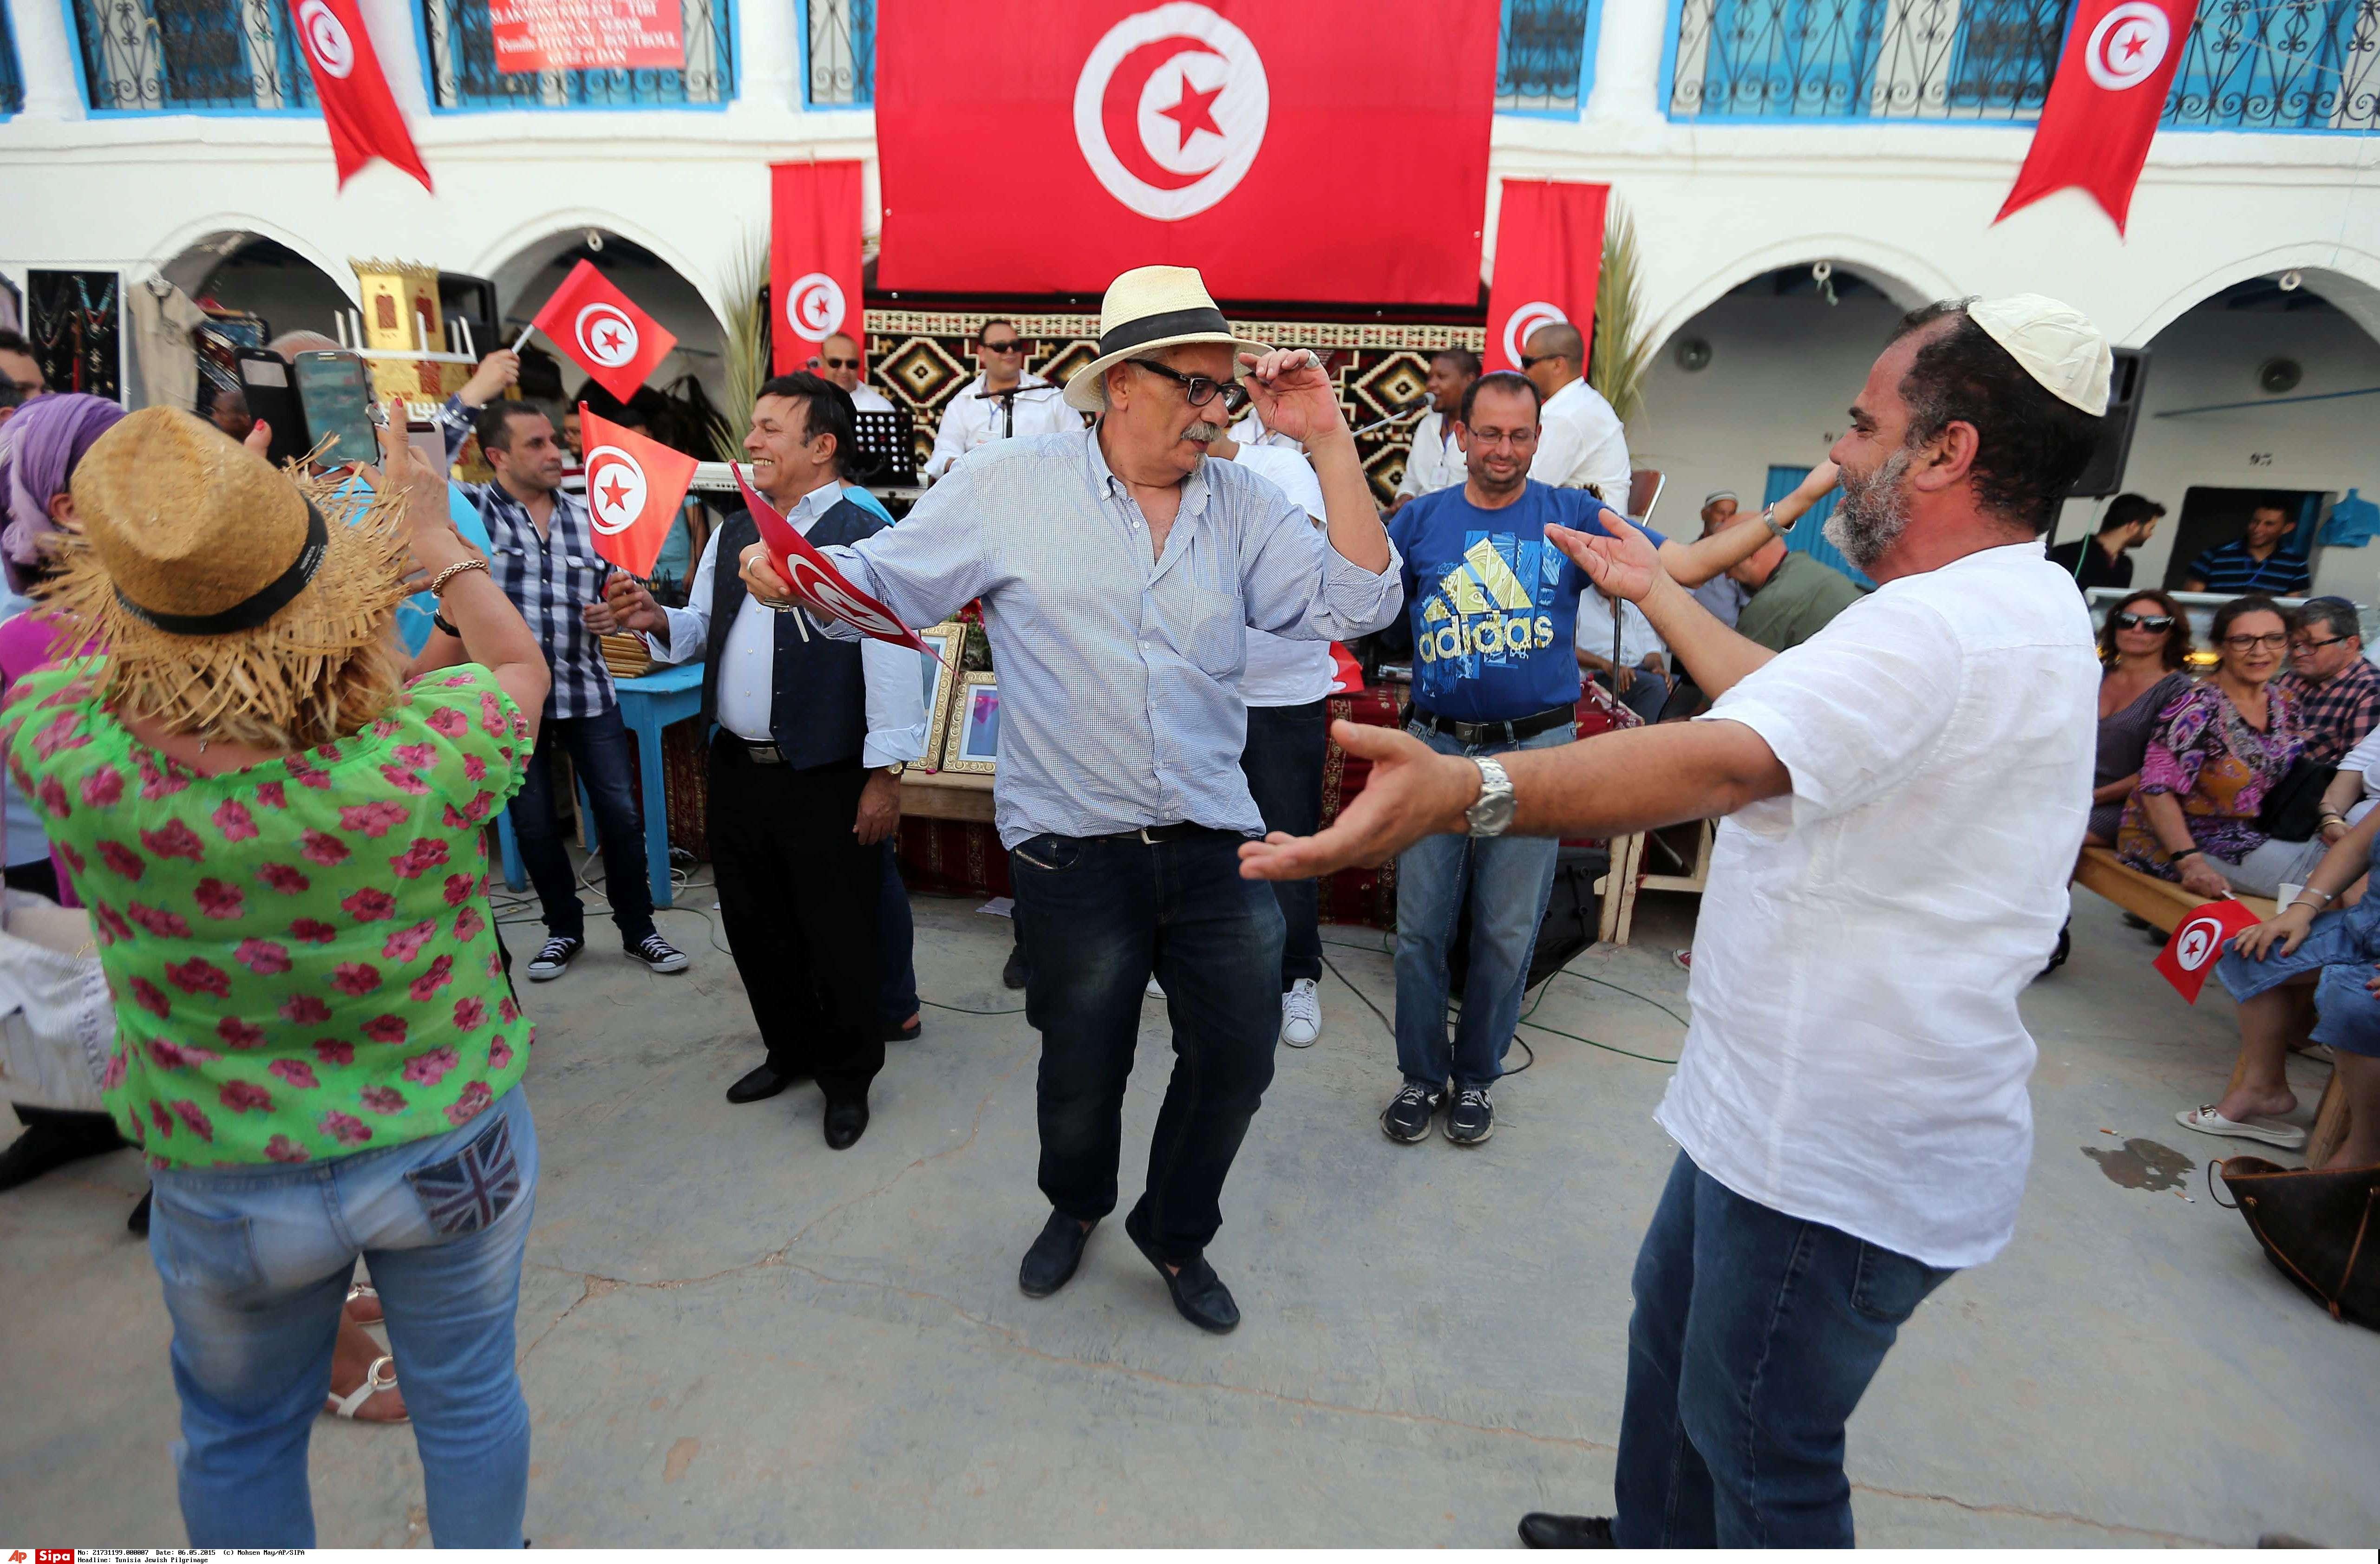 Danse lors du pèlerinage de la Ghriba en 2015.